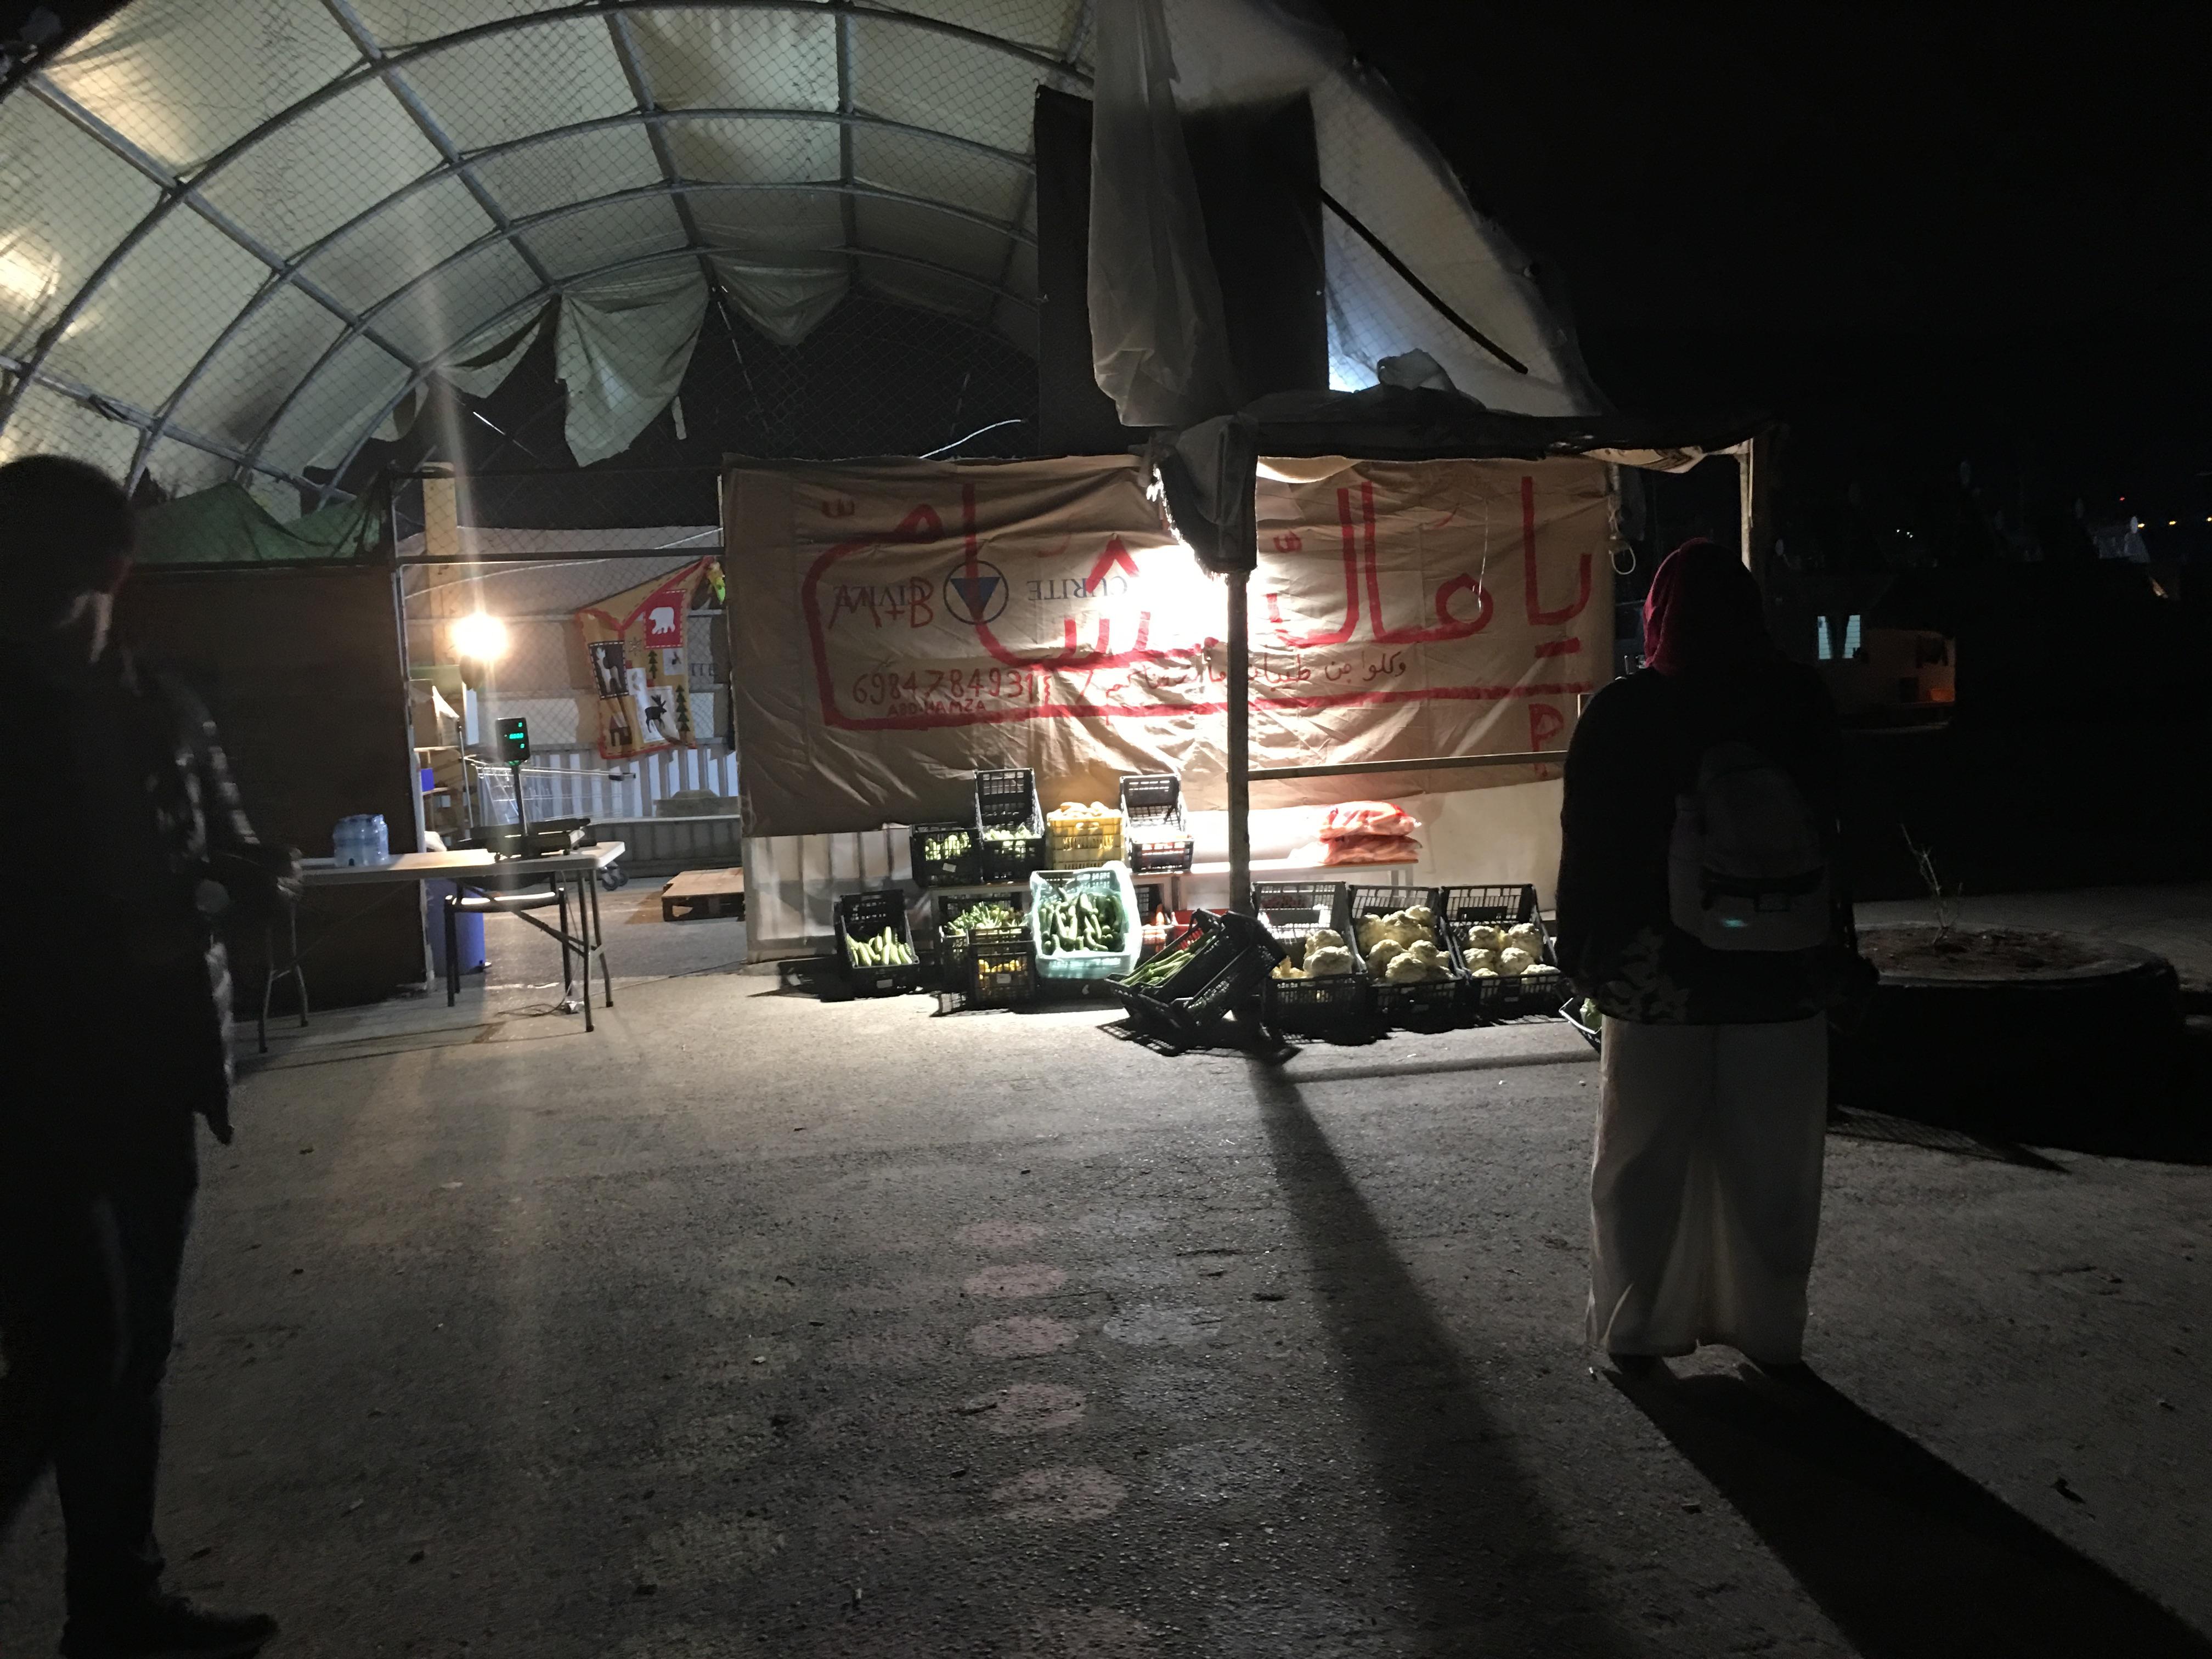 Grocery still open at night